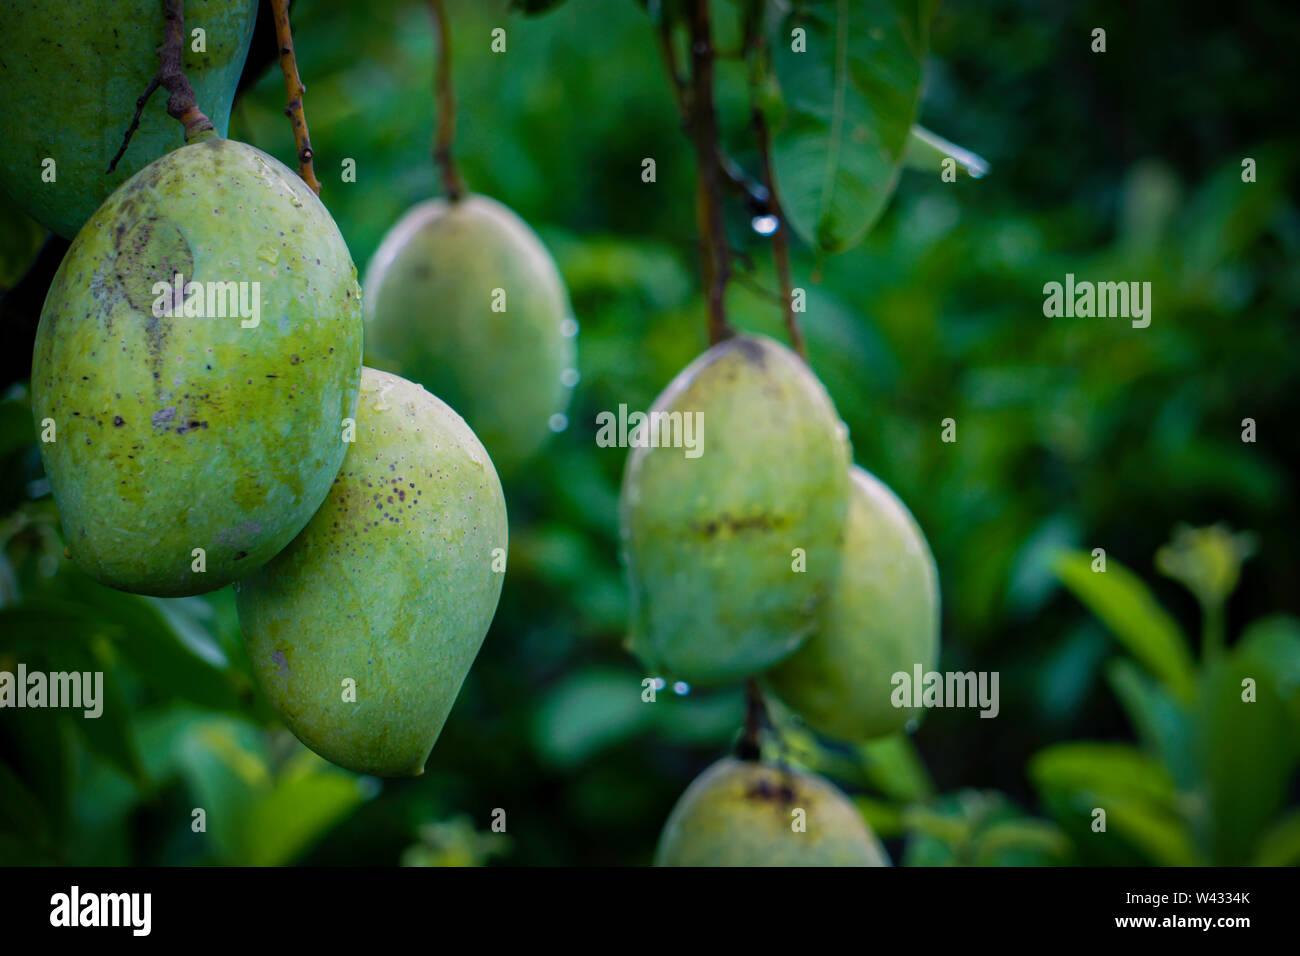 Tree with mango fruits hanging from branches in a garden. Selective focus.. Green Fresh Big Size Bangladeshi Mango, Rajshahi Langra Mango or Amropali - Stock Image